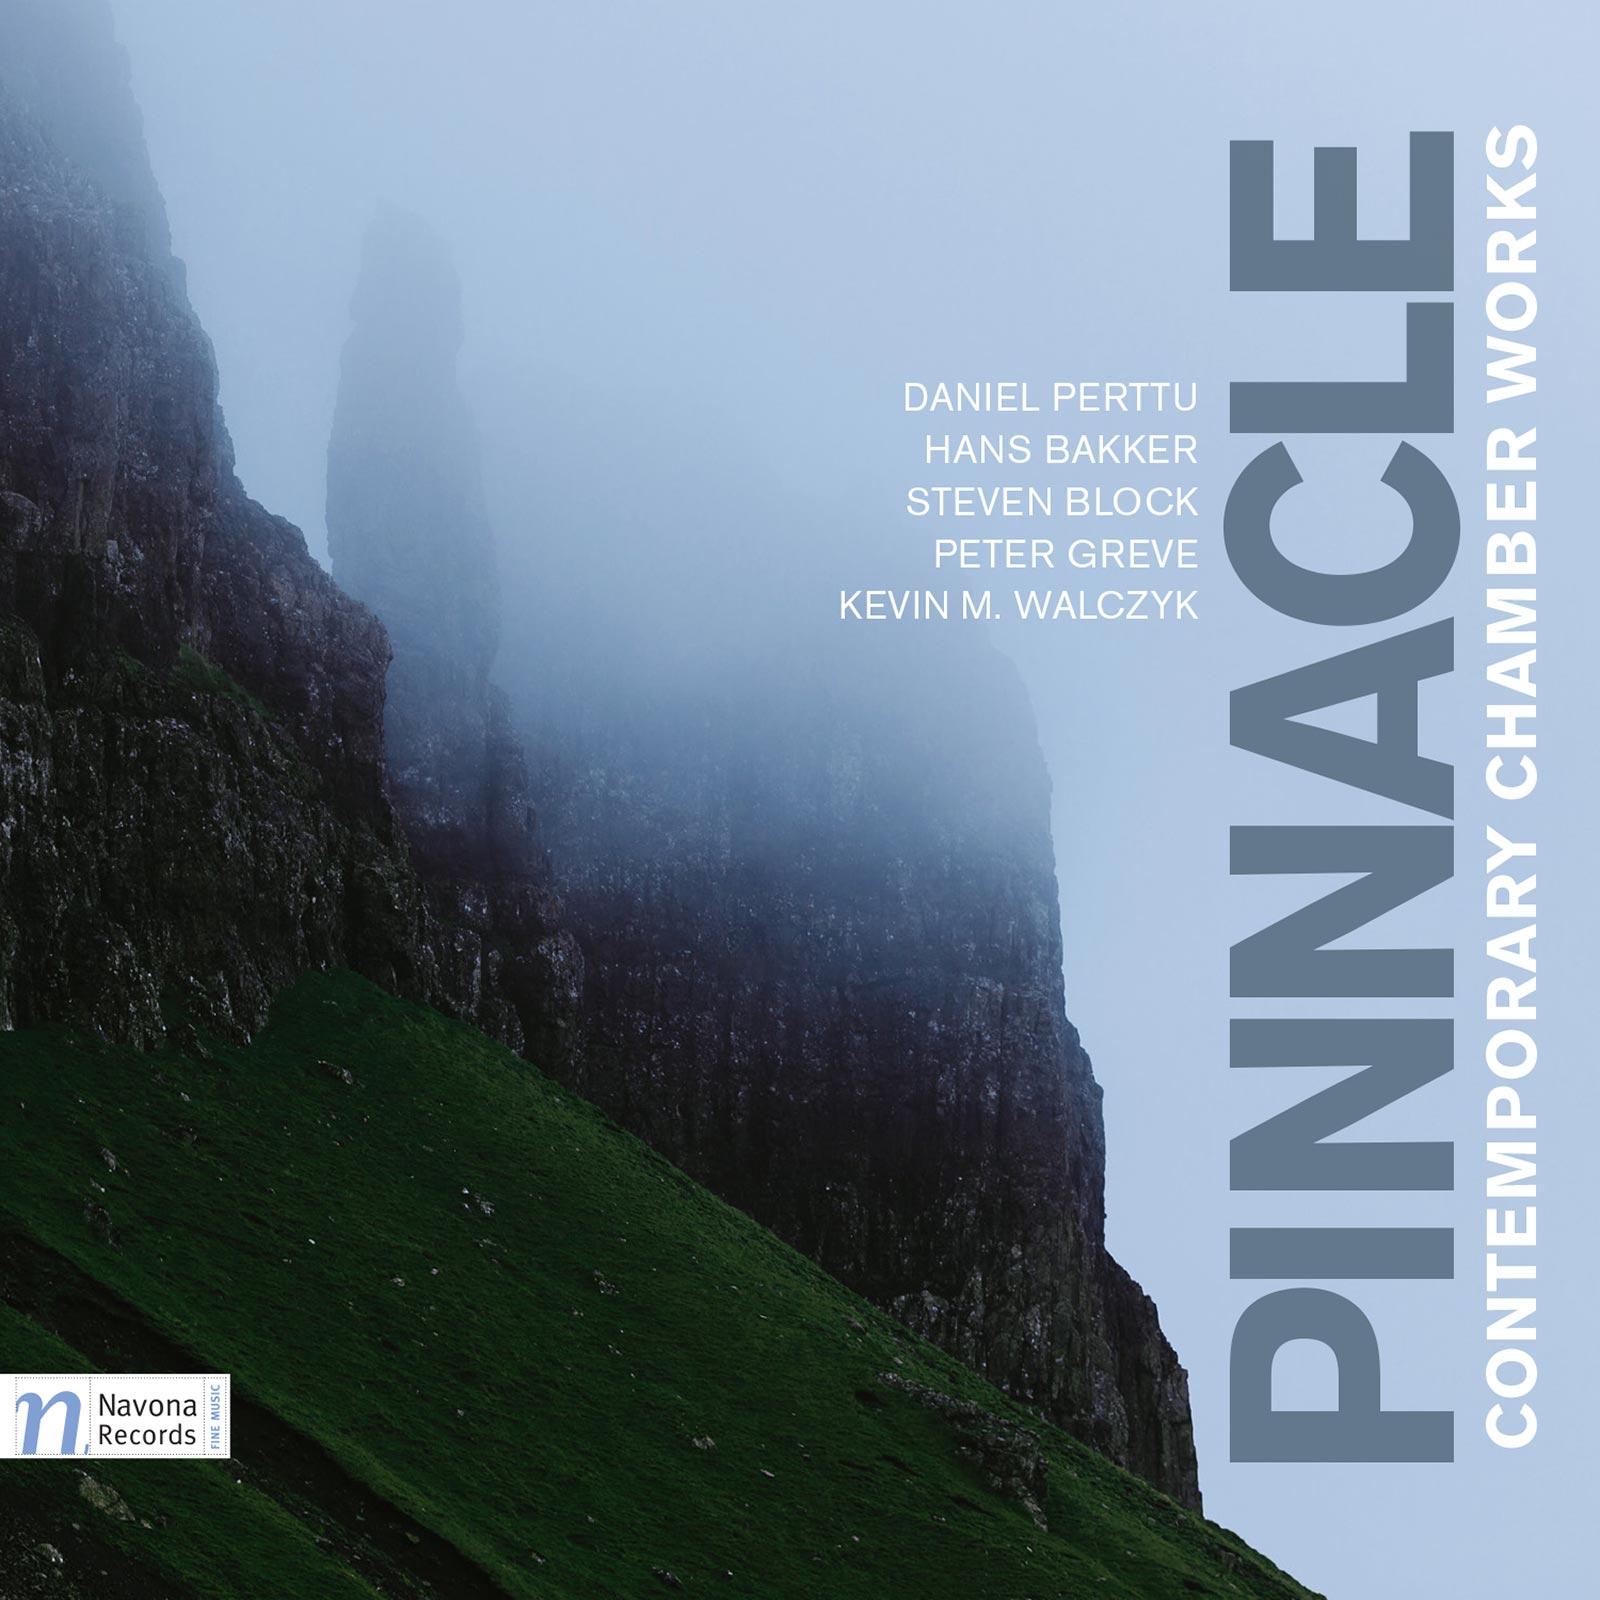 PINNACLE - album cover